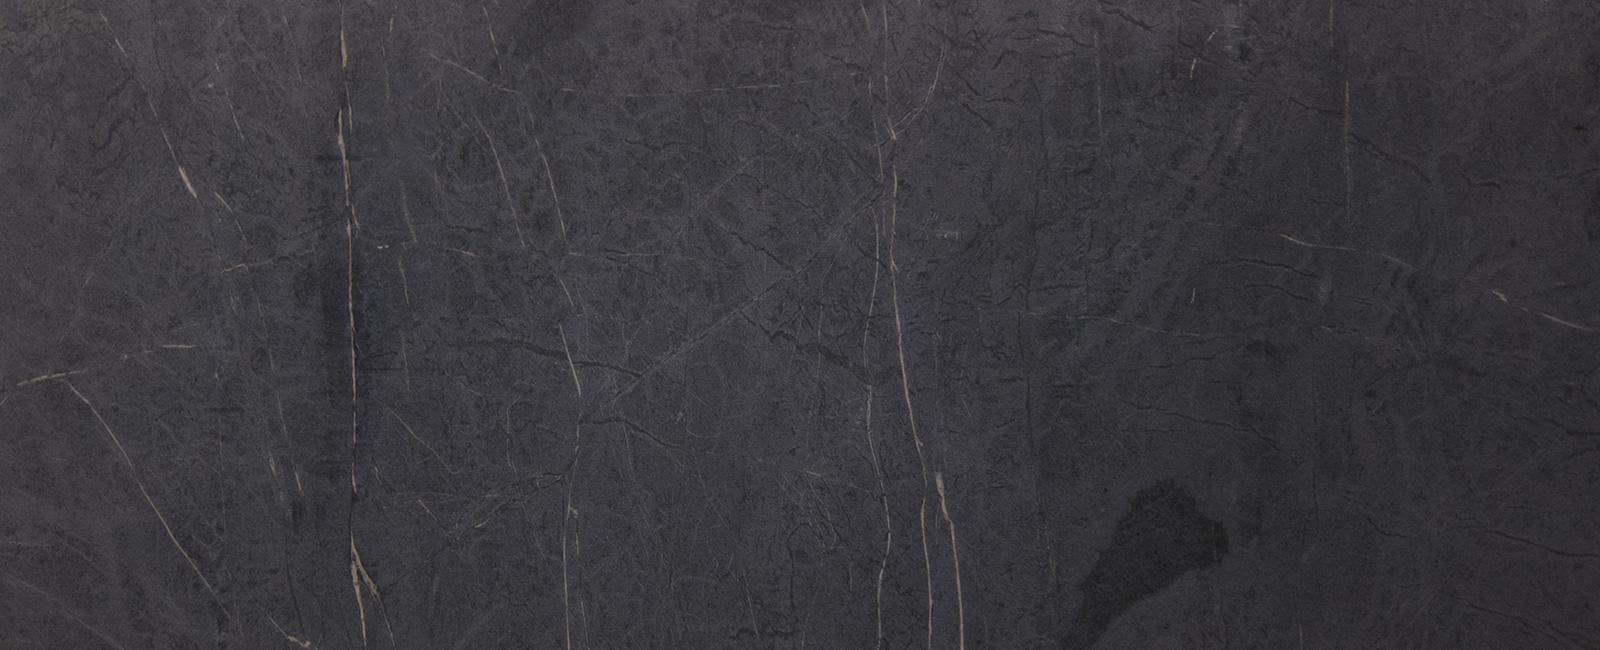 Soapstone Marva Marble And Granite